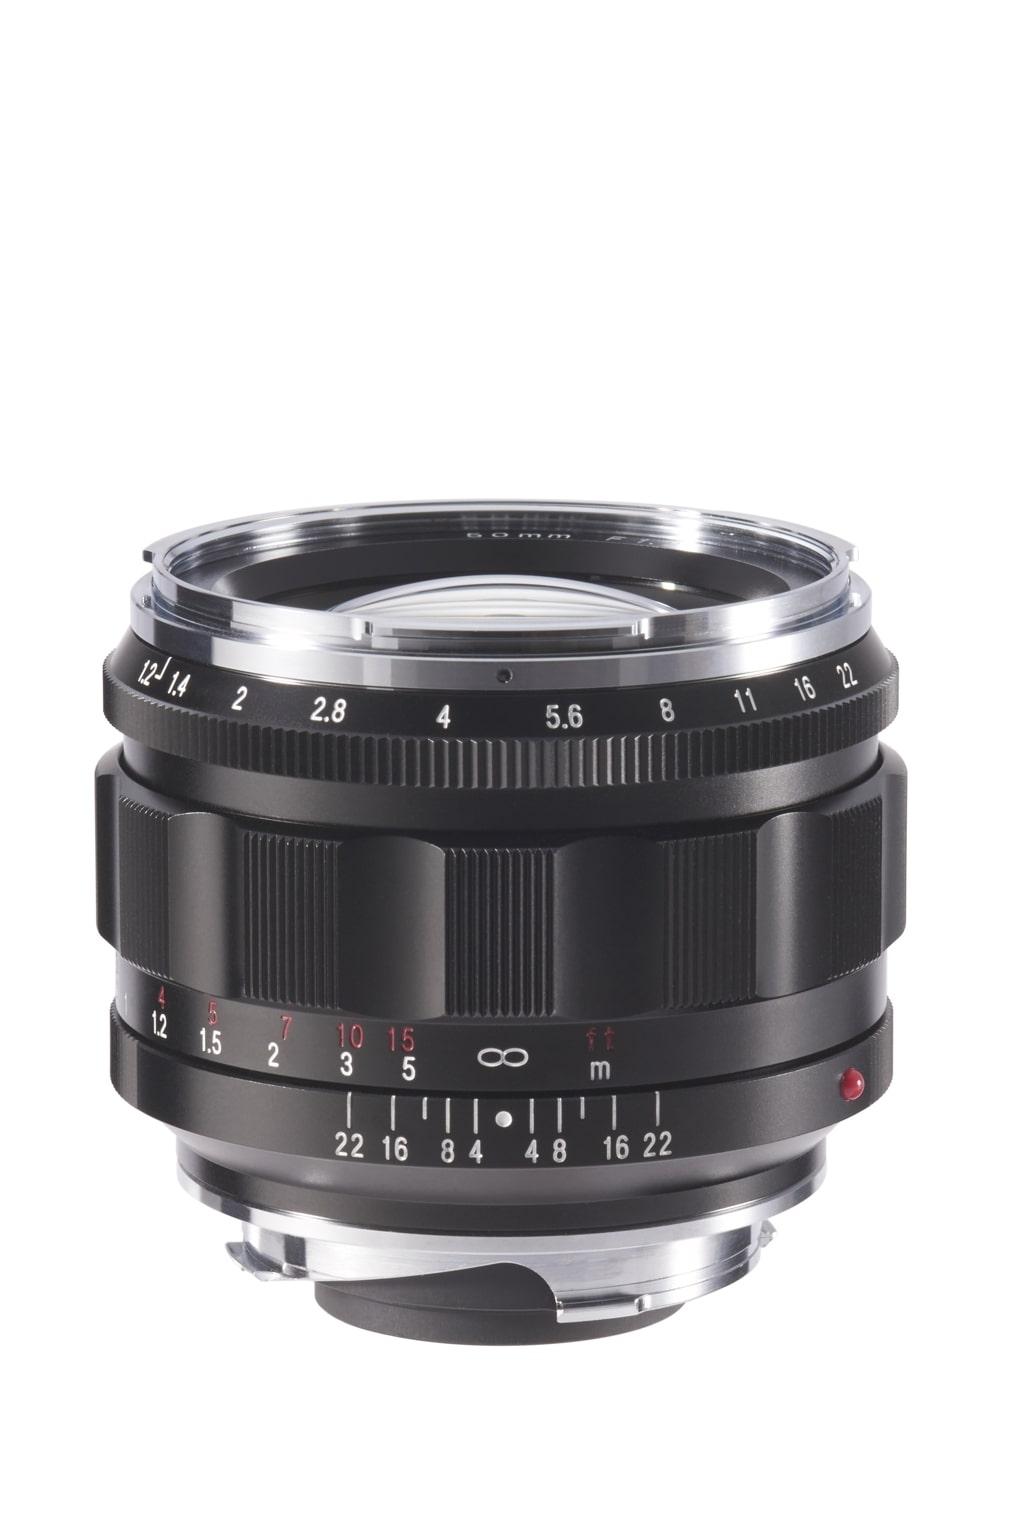 Voigtländer VM 50mm 1,2 Nokton asphärisch Leica M schwarz